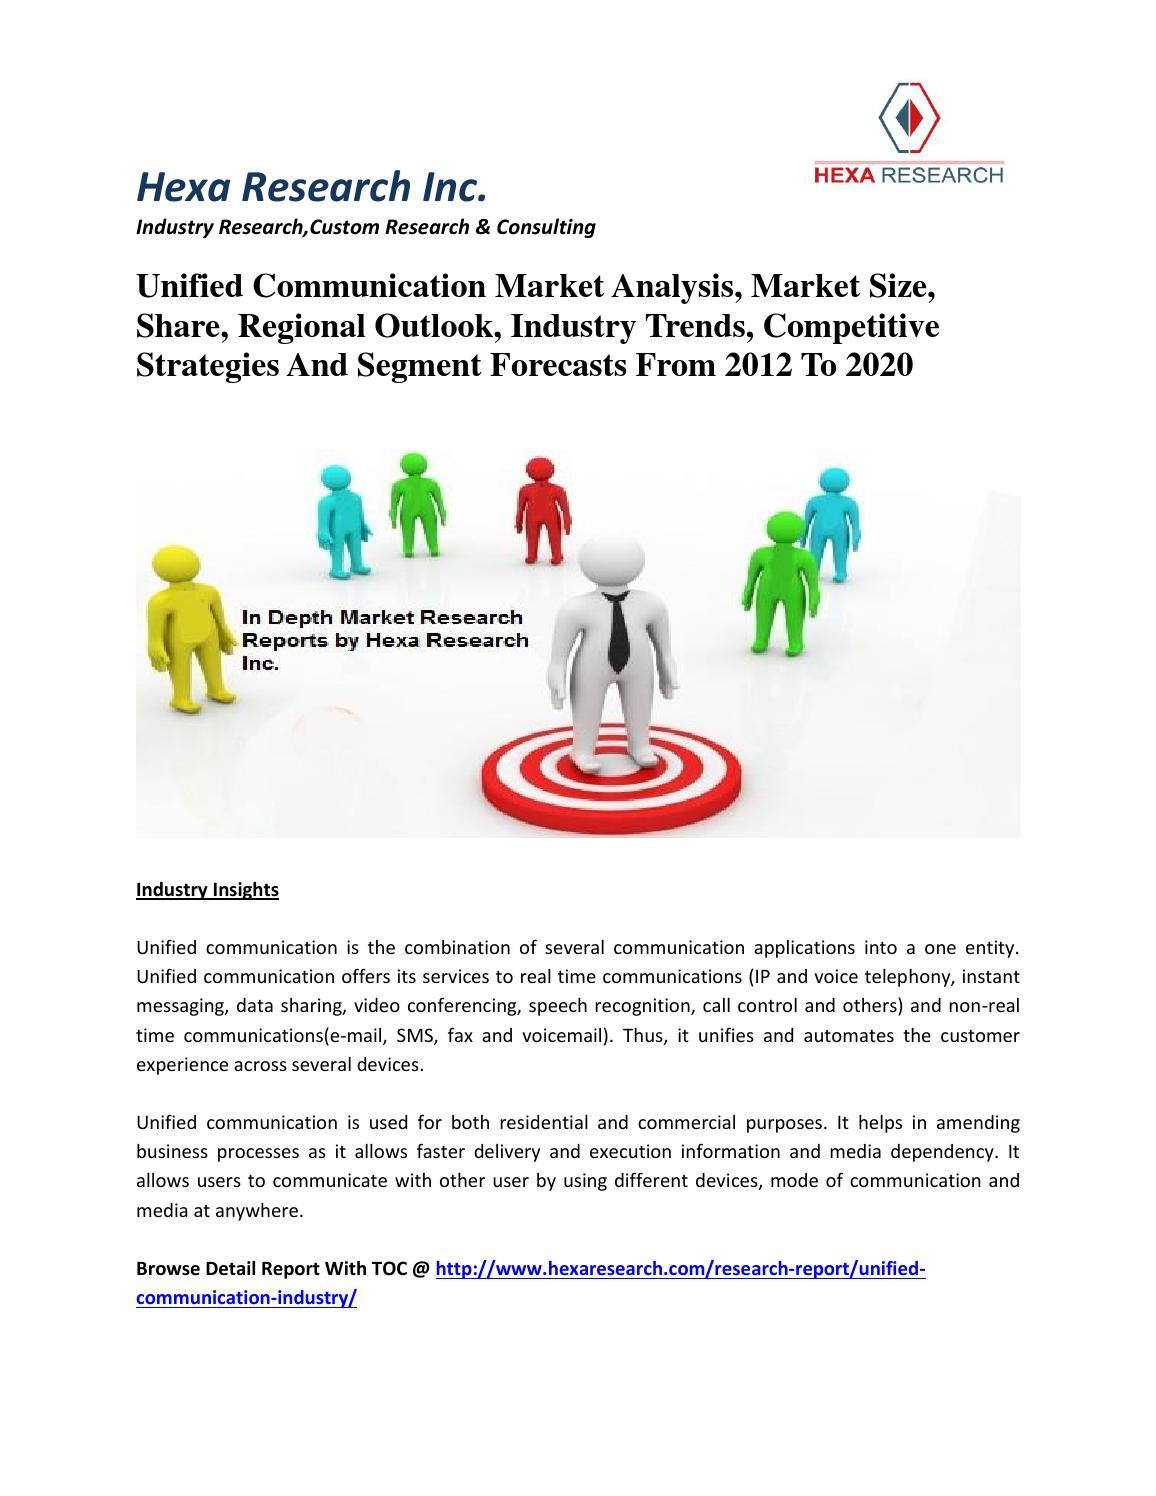 Unified communication market analysis, market size, share